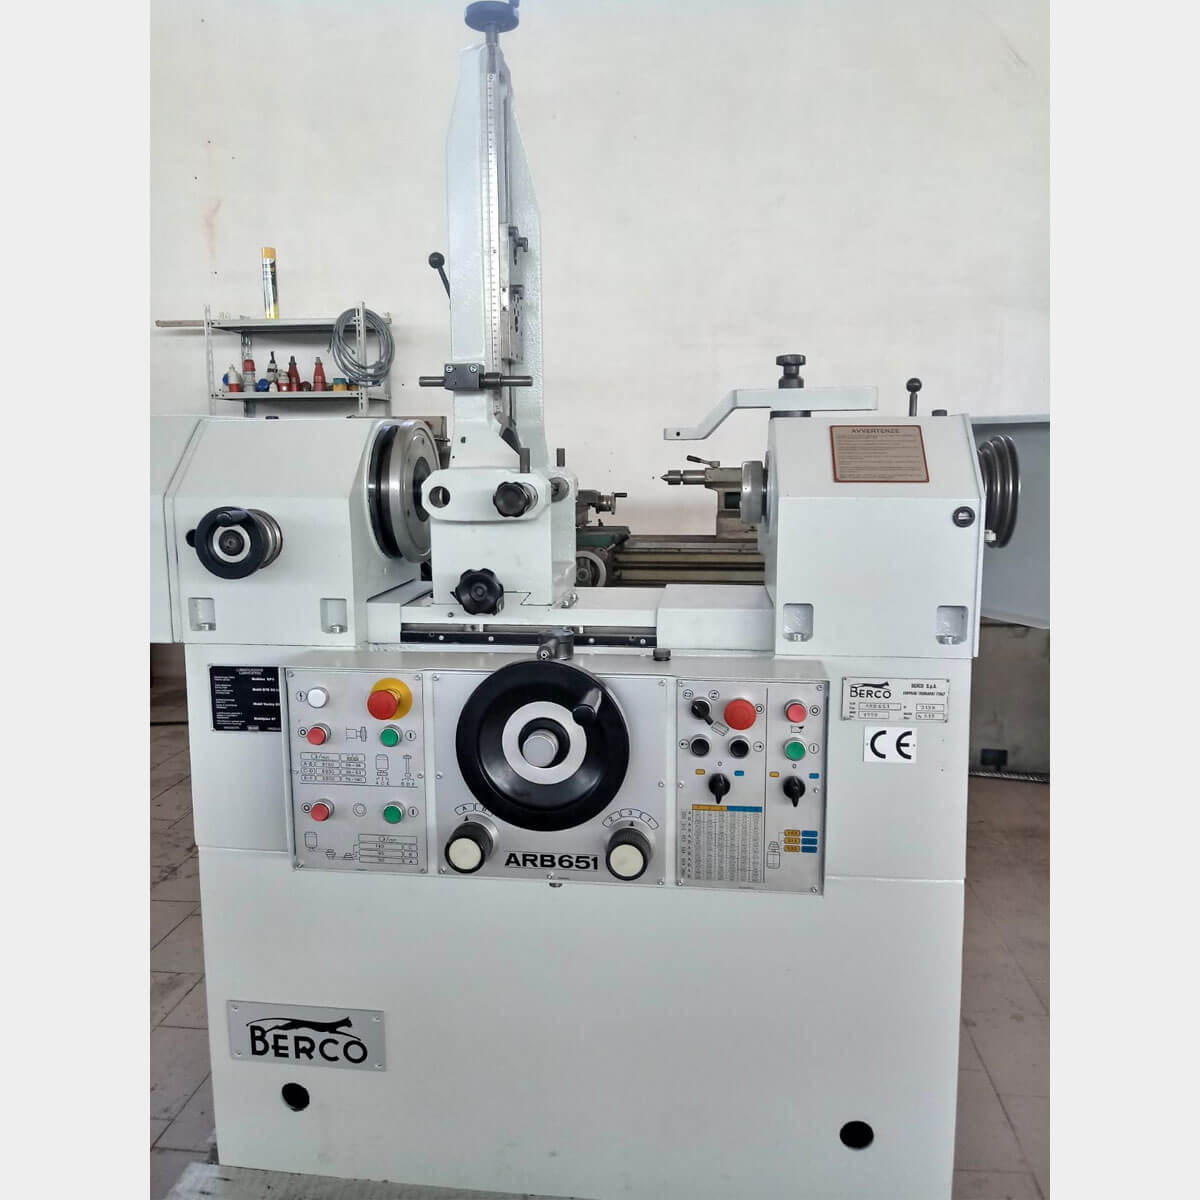 MU329-BERCO-ARB-651-Conrod-Boring-Machine